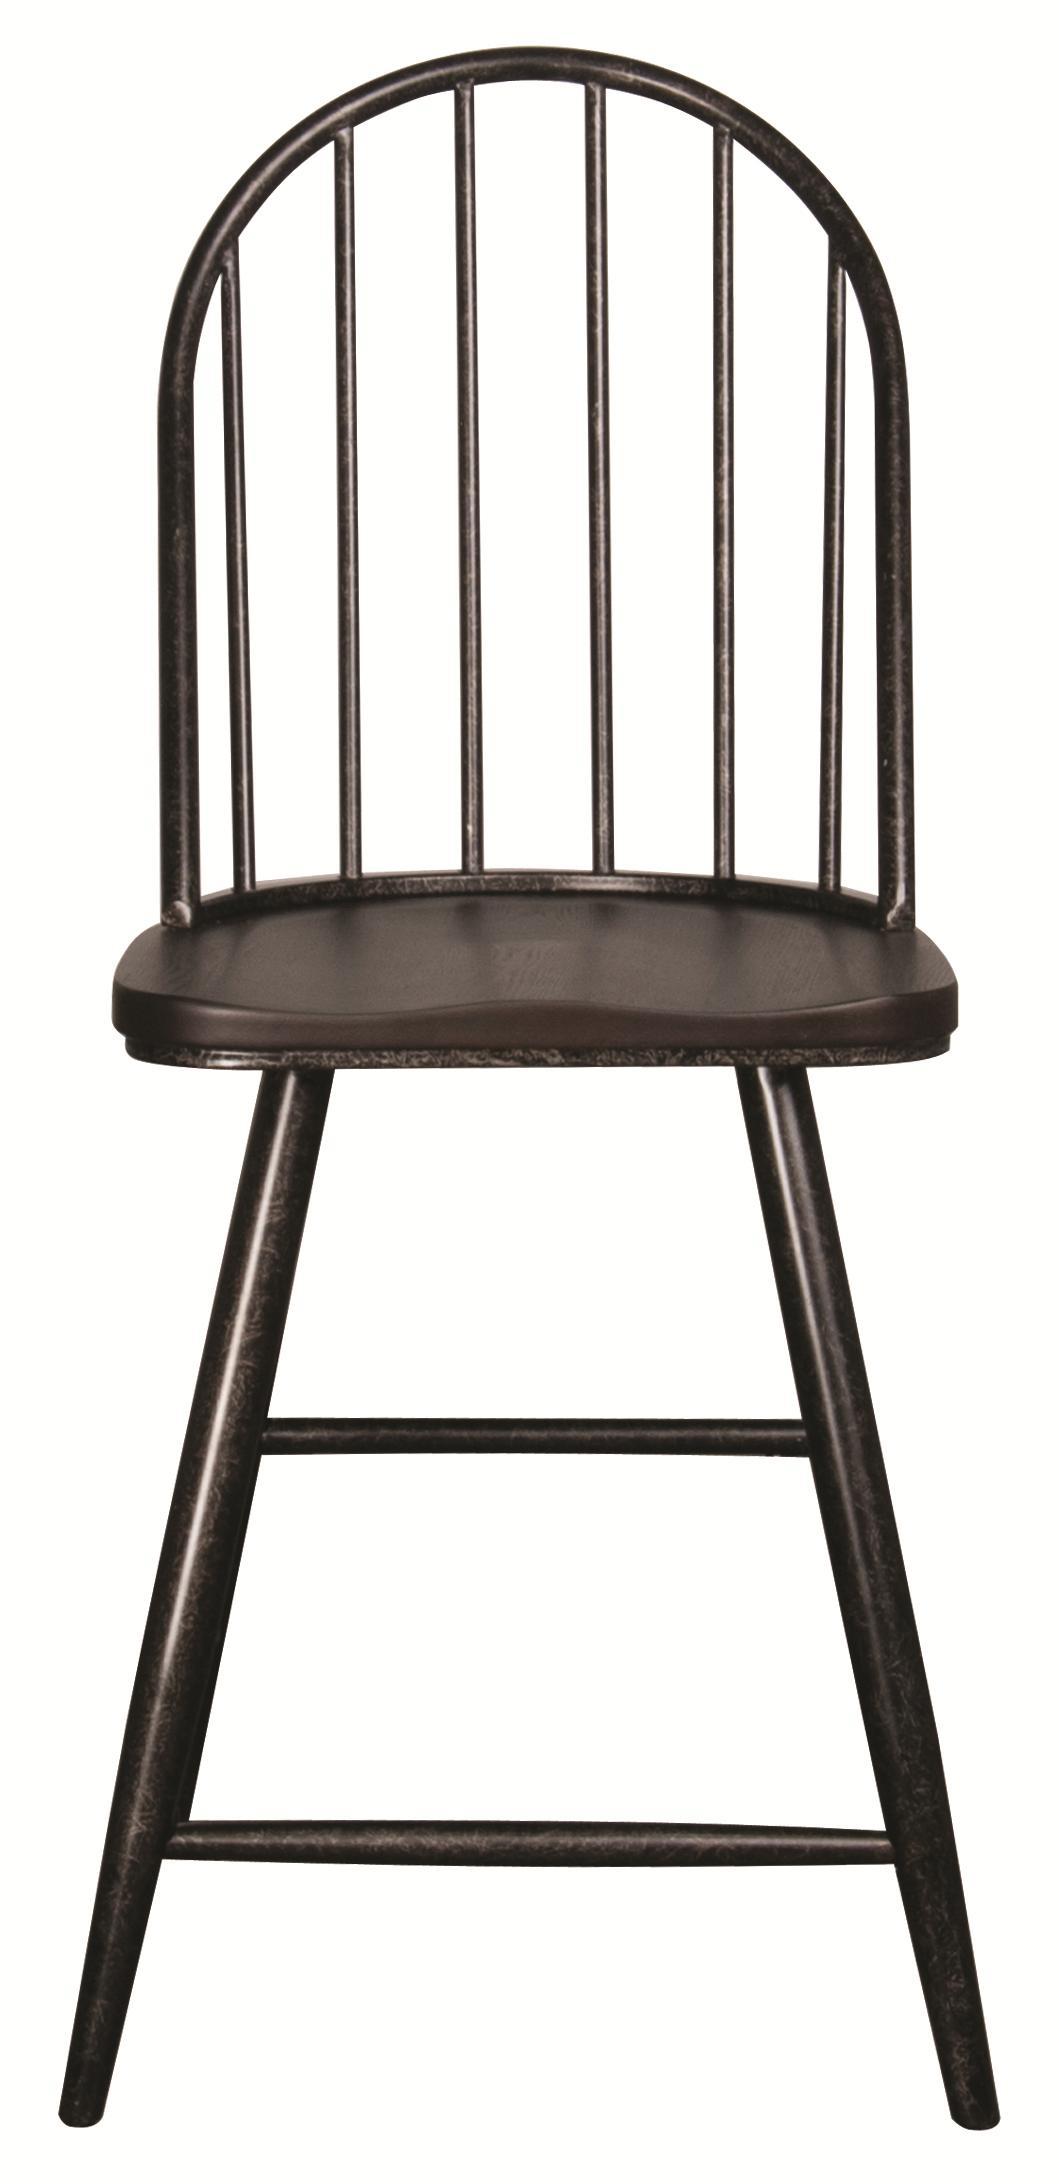 "Morris Home Furnishings Hardin Hardin 24"" Barstool - Item Number: HR600CC"